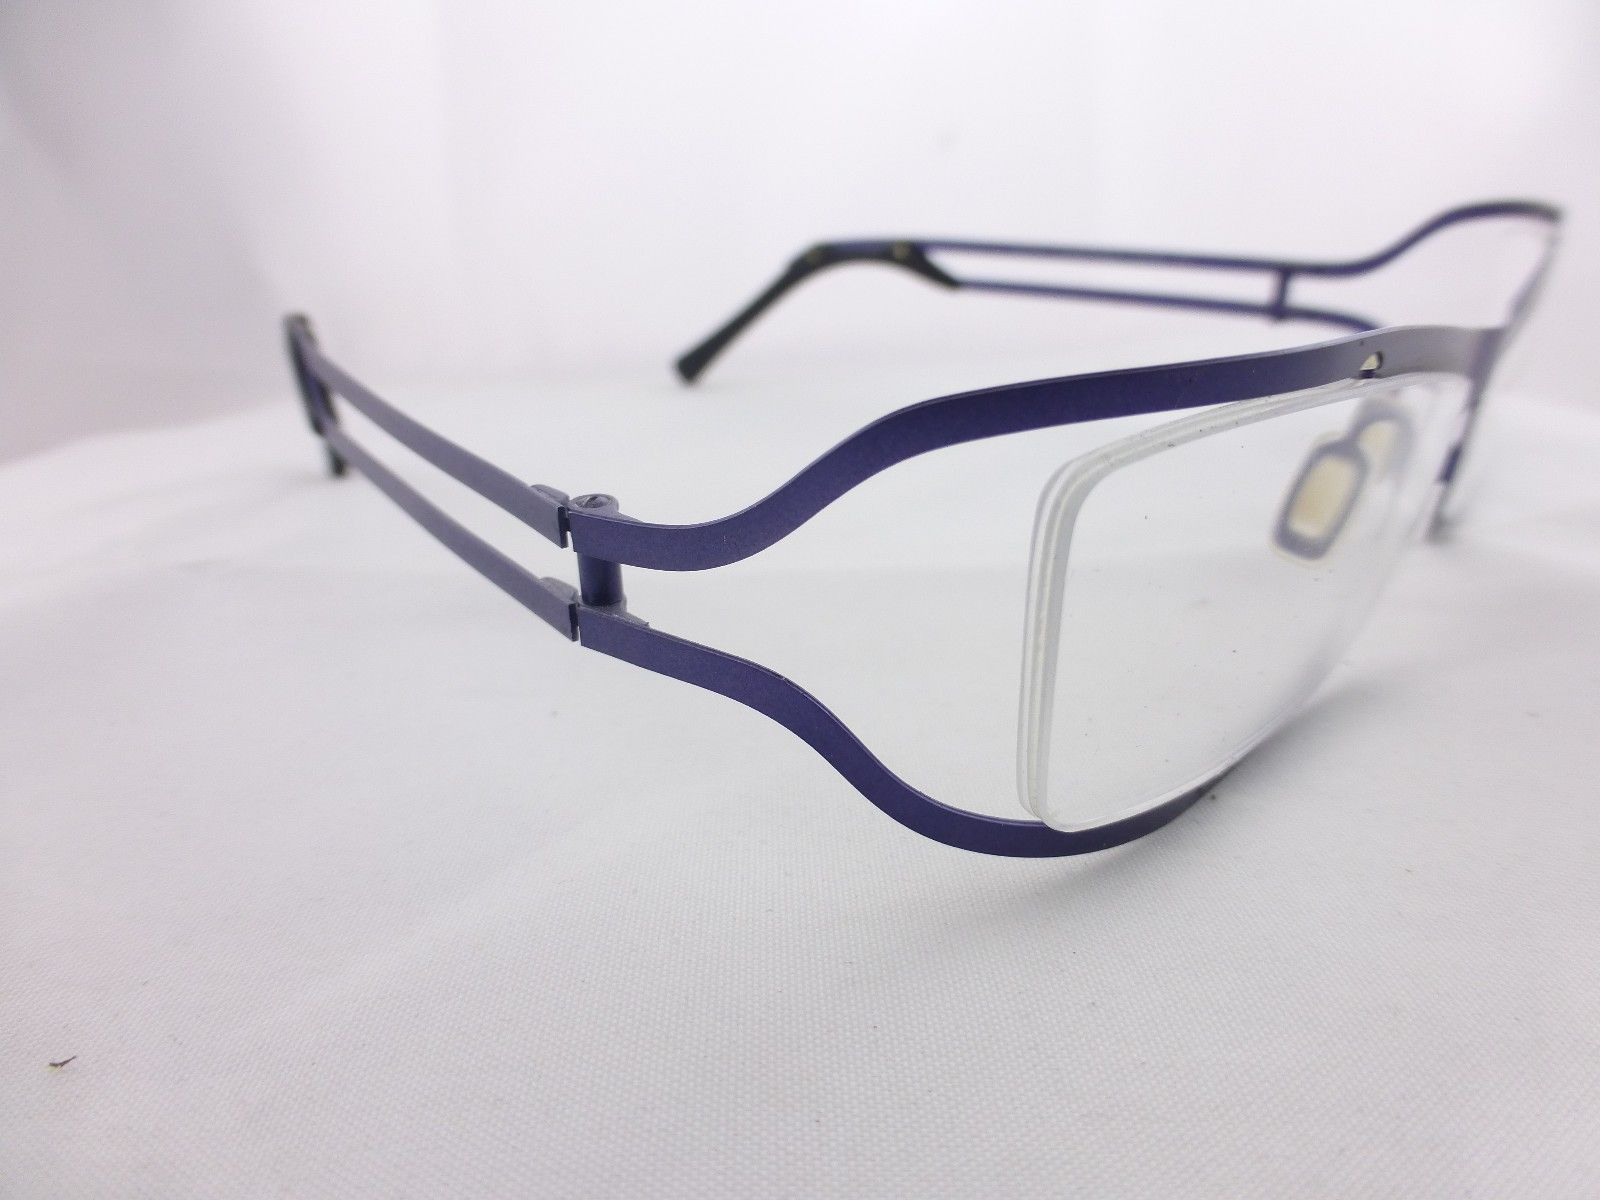 Glasses Frame Made In France : EYE DC eyeglasses Great Looking frame, Purpule , Mod. V422 ...